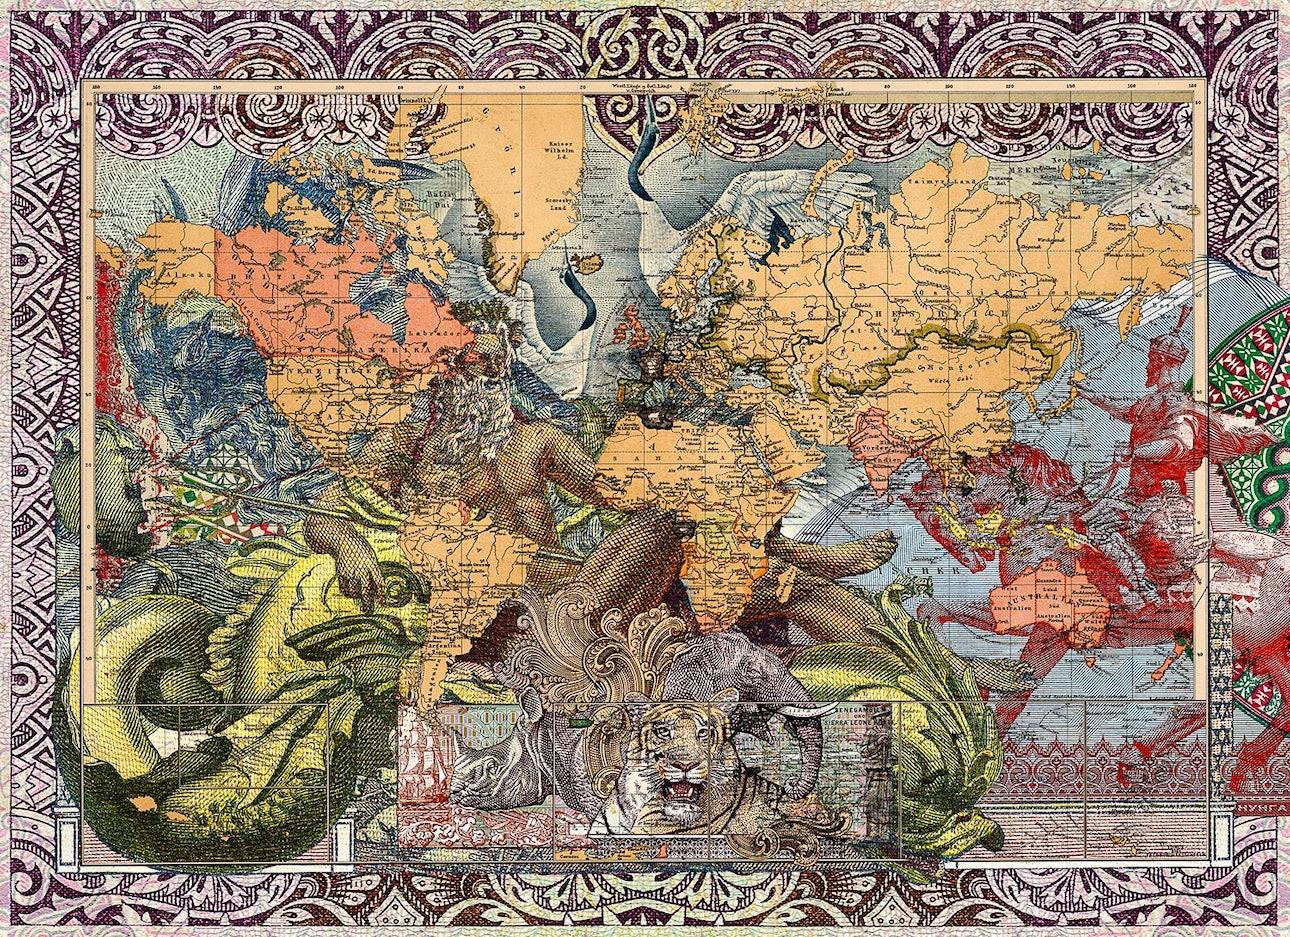 7---Figures-1853,-Kolonien-in-Afrika-und-in-der-Sud-See